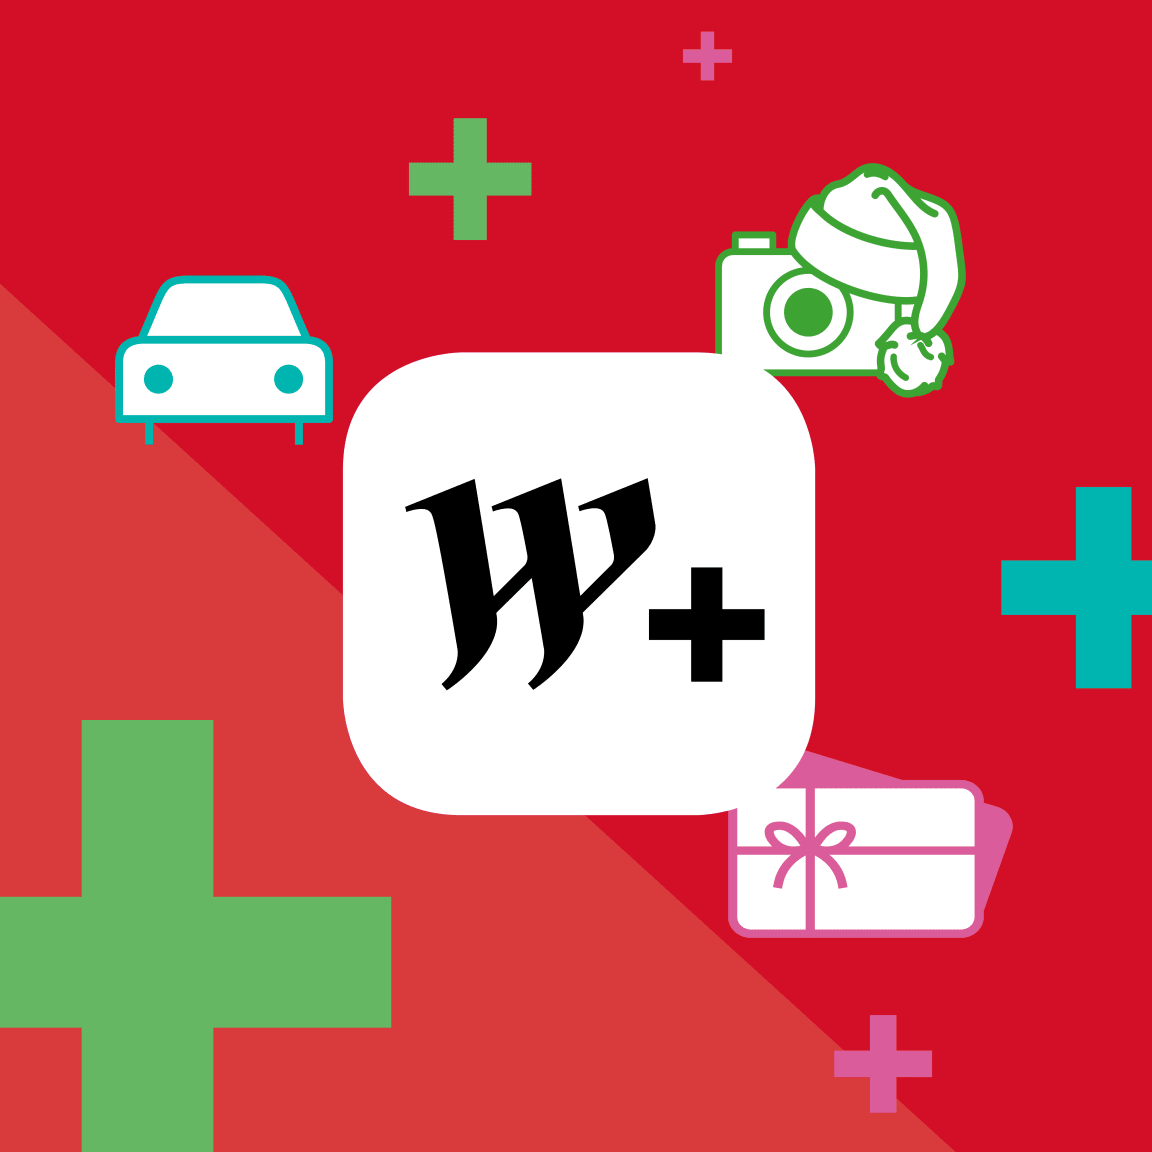 Get a bonus digital Santa photo and more with Westfield Plus